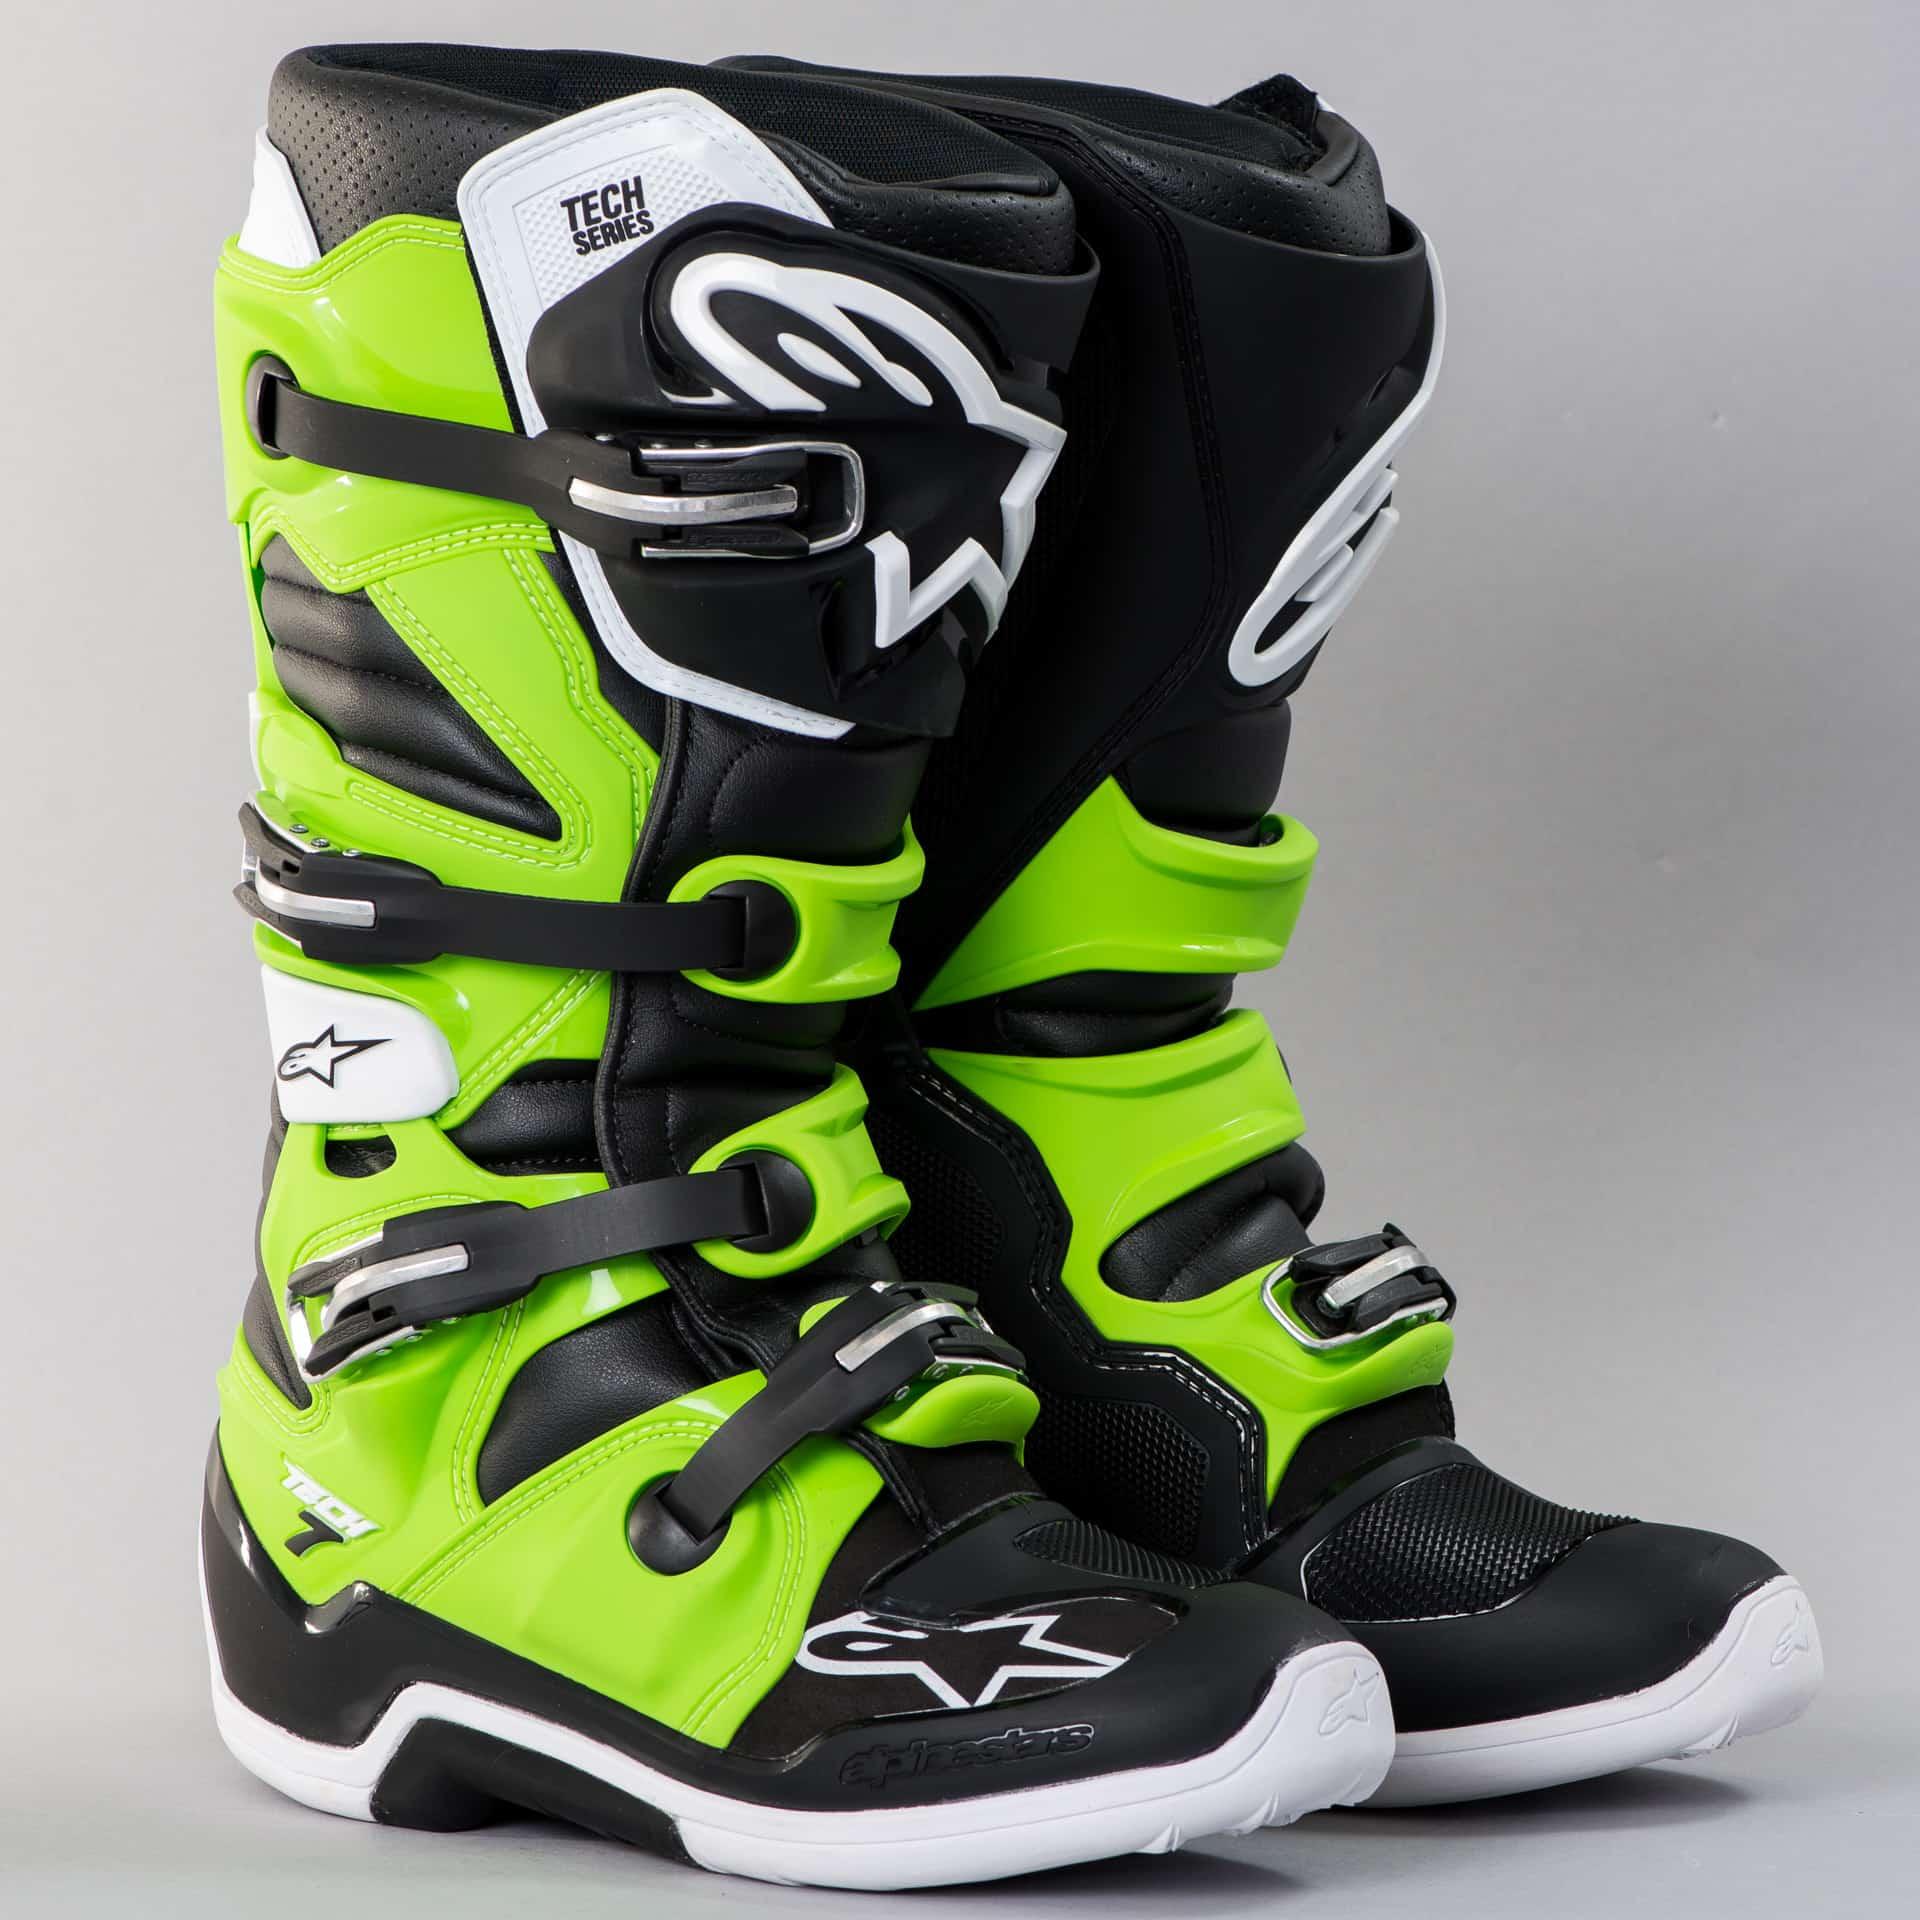 Alpinestars Tech 7 Boots Black-Green